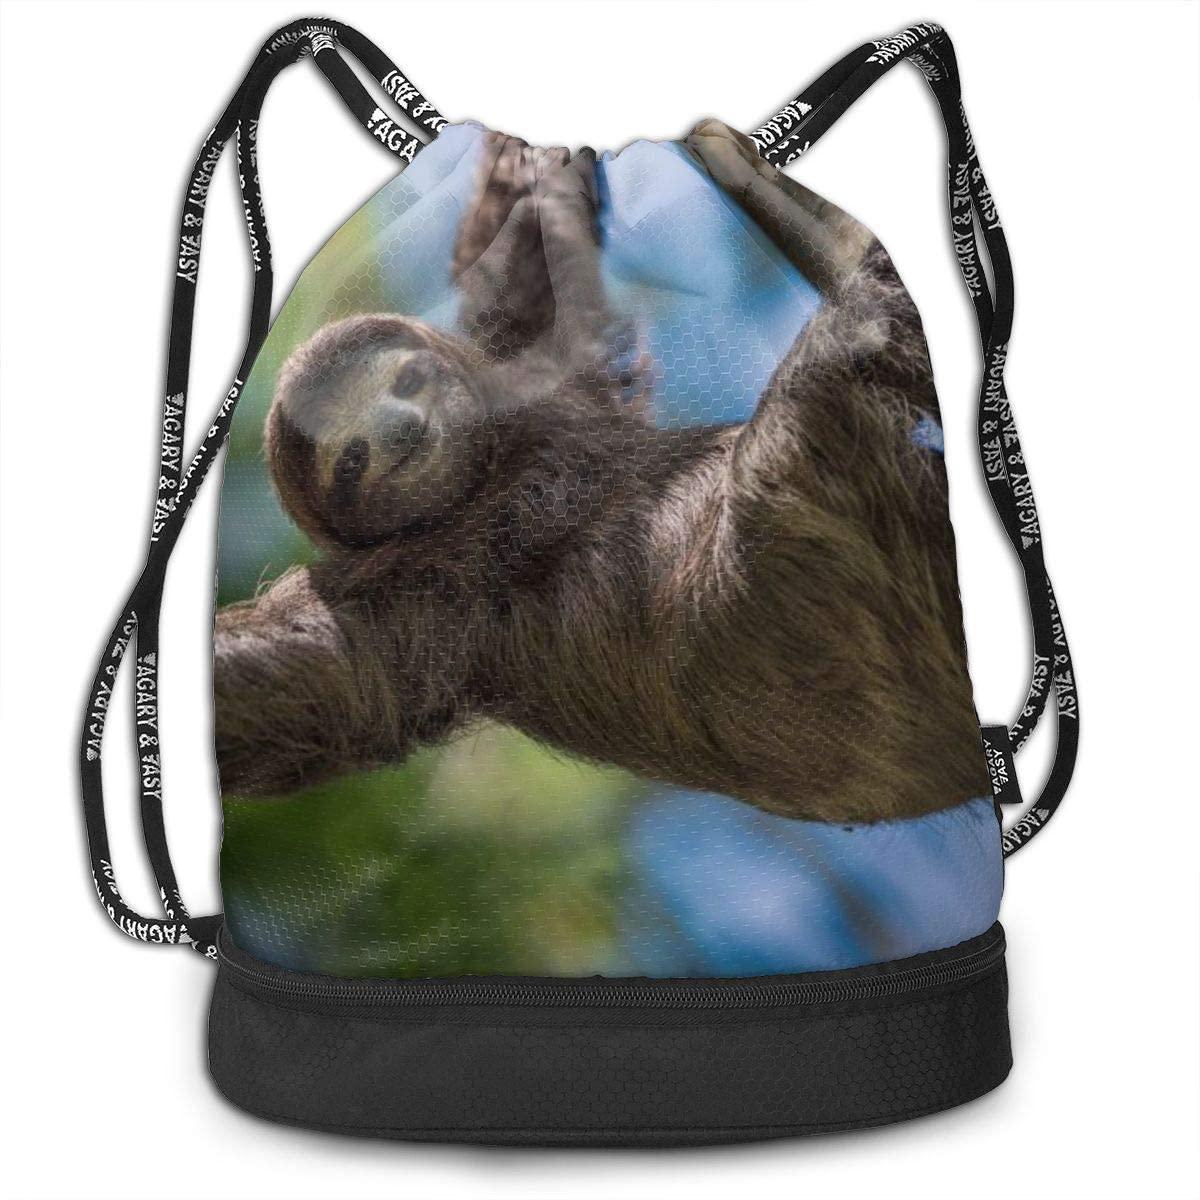 Bundle Backpacks Happy Sloth Gym Sack Drawstring Bags Casual Daypack Yoga Bag School Training Pouch